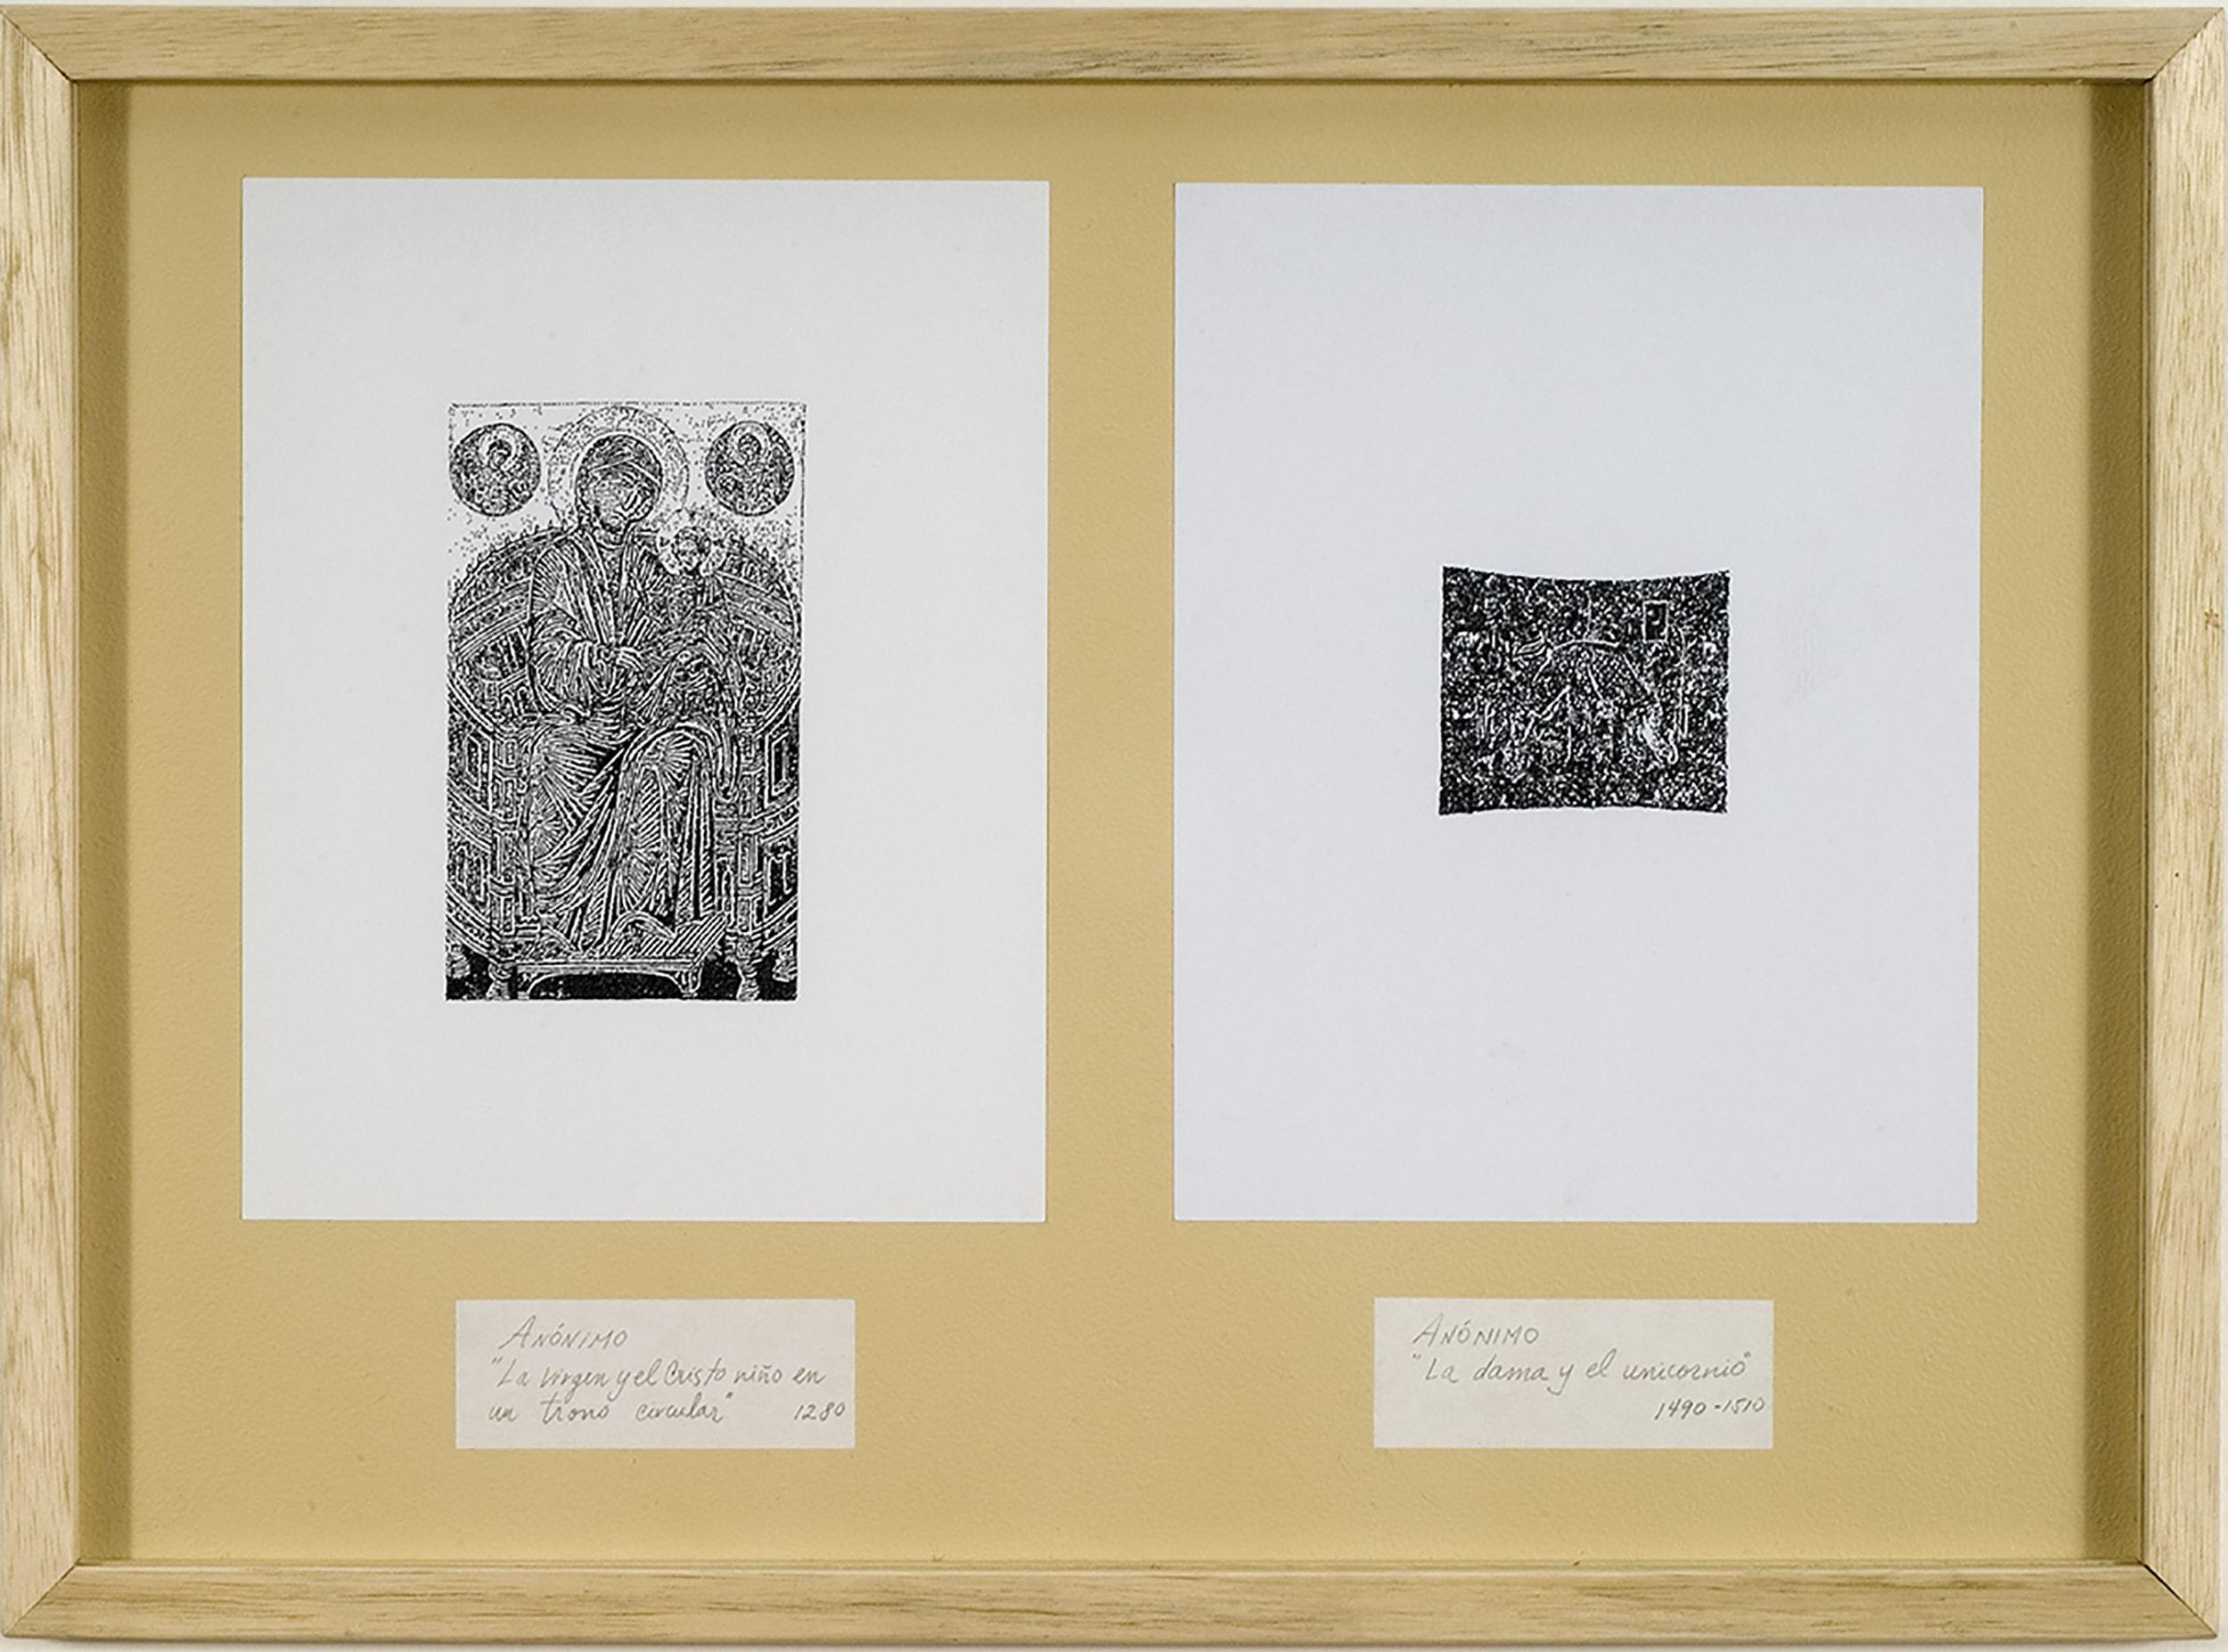 1000 drawings anonymus esteban peña art